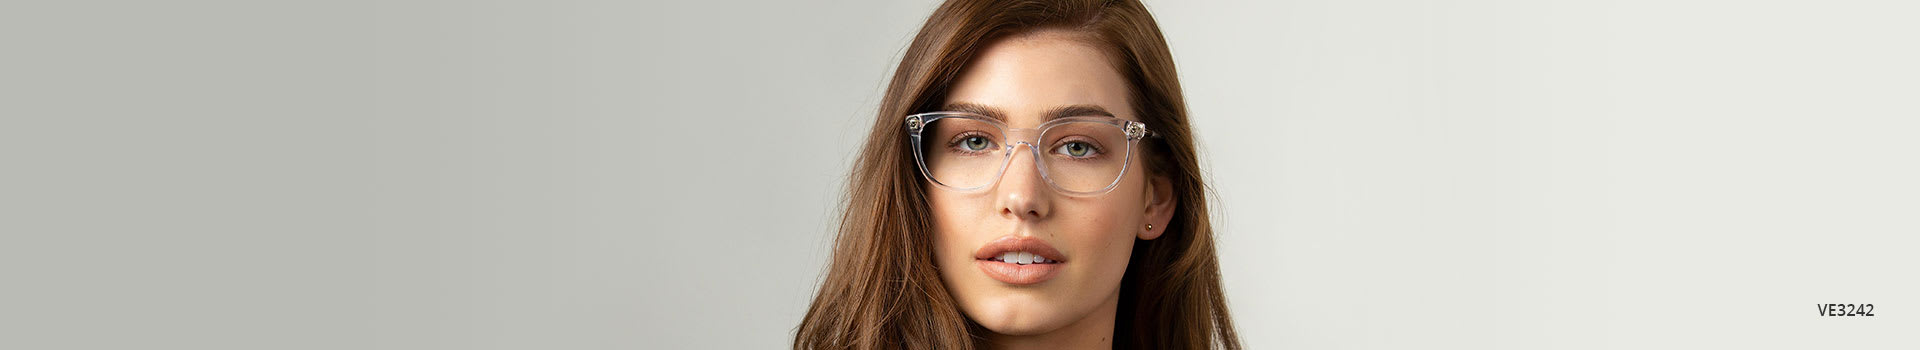 Shop Women'sEyeglasses & Sunglasses - featuring Versace VE3242A